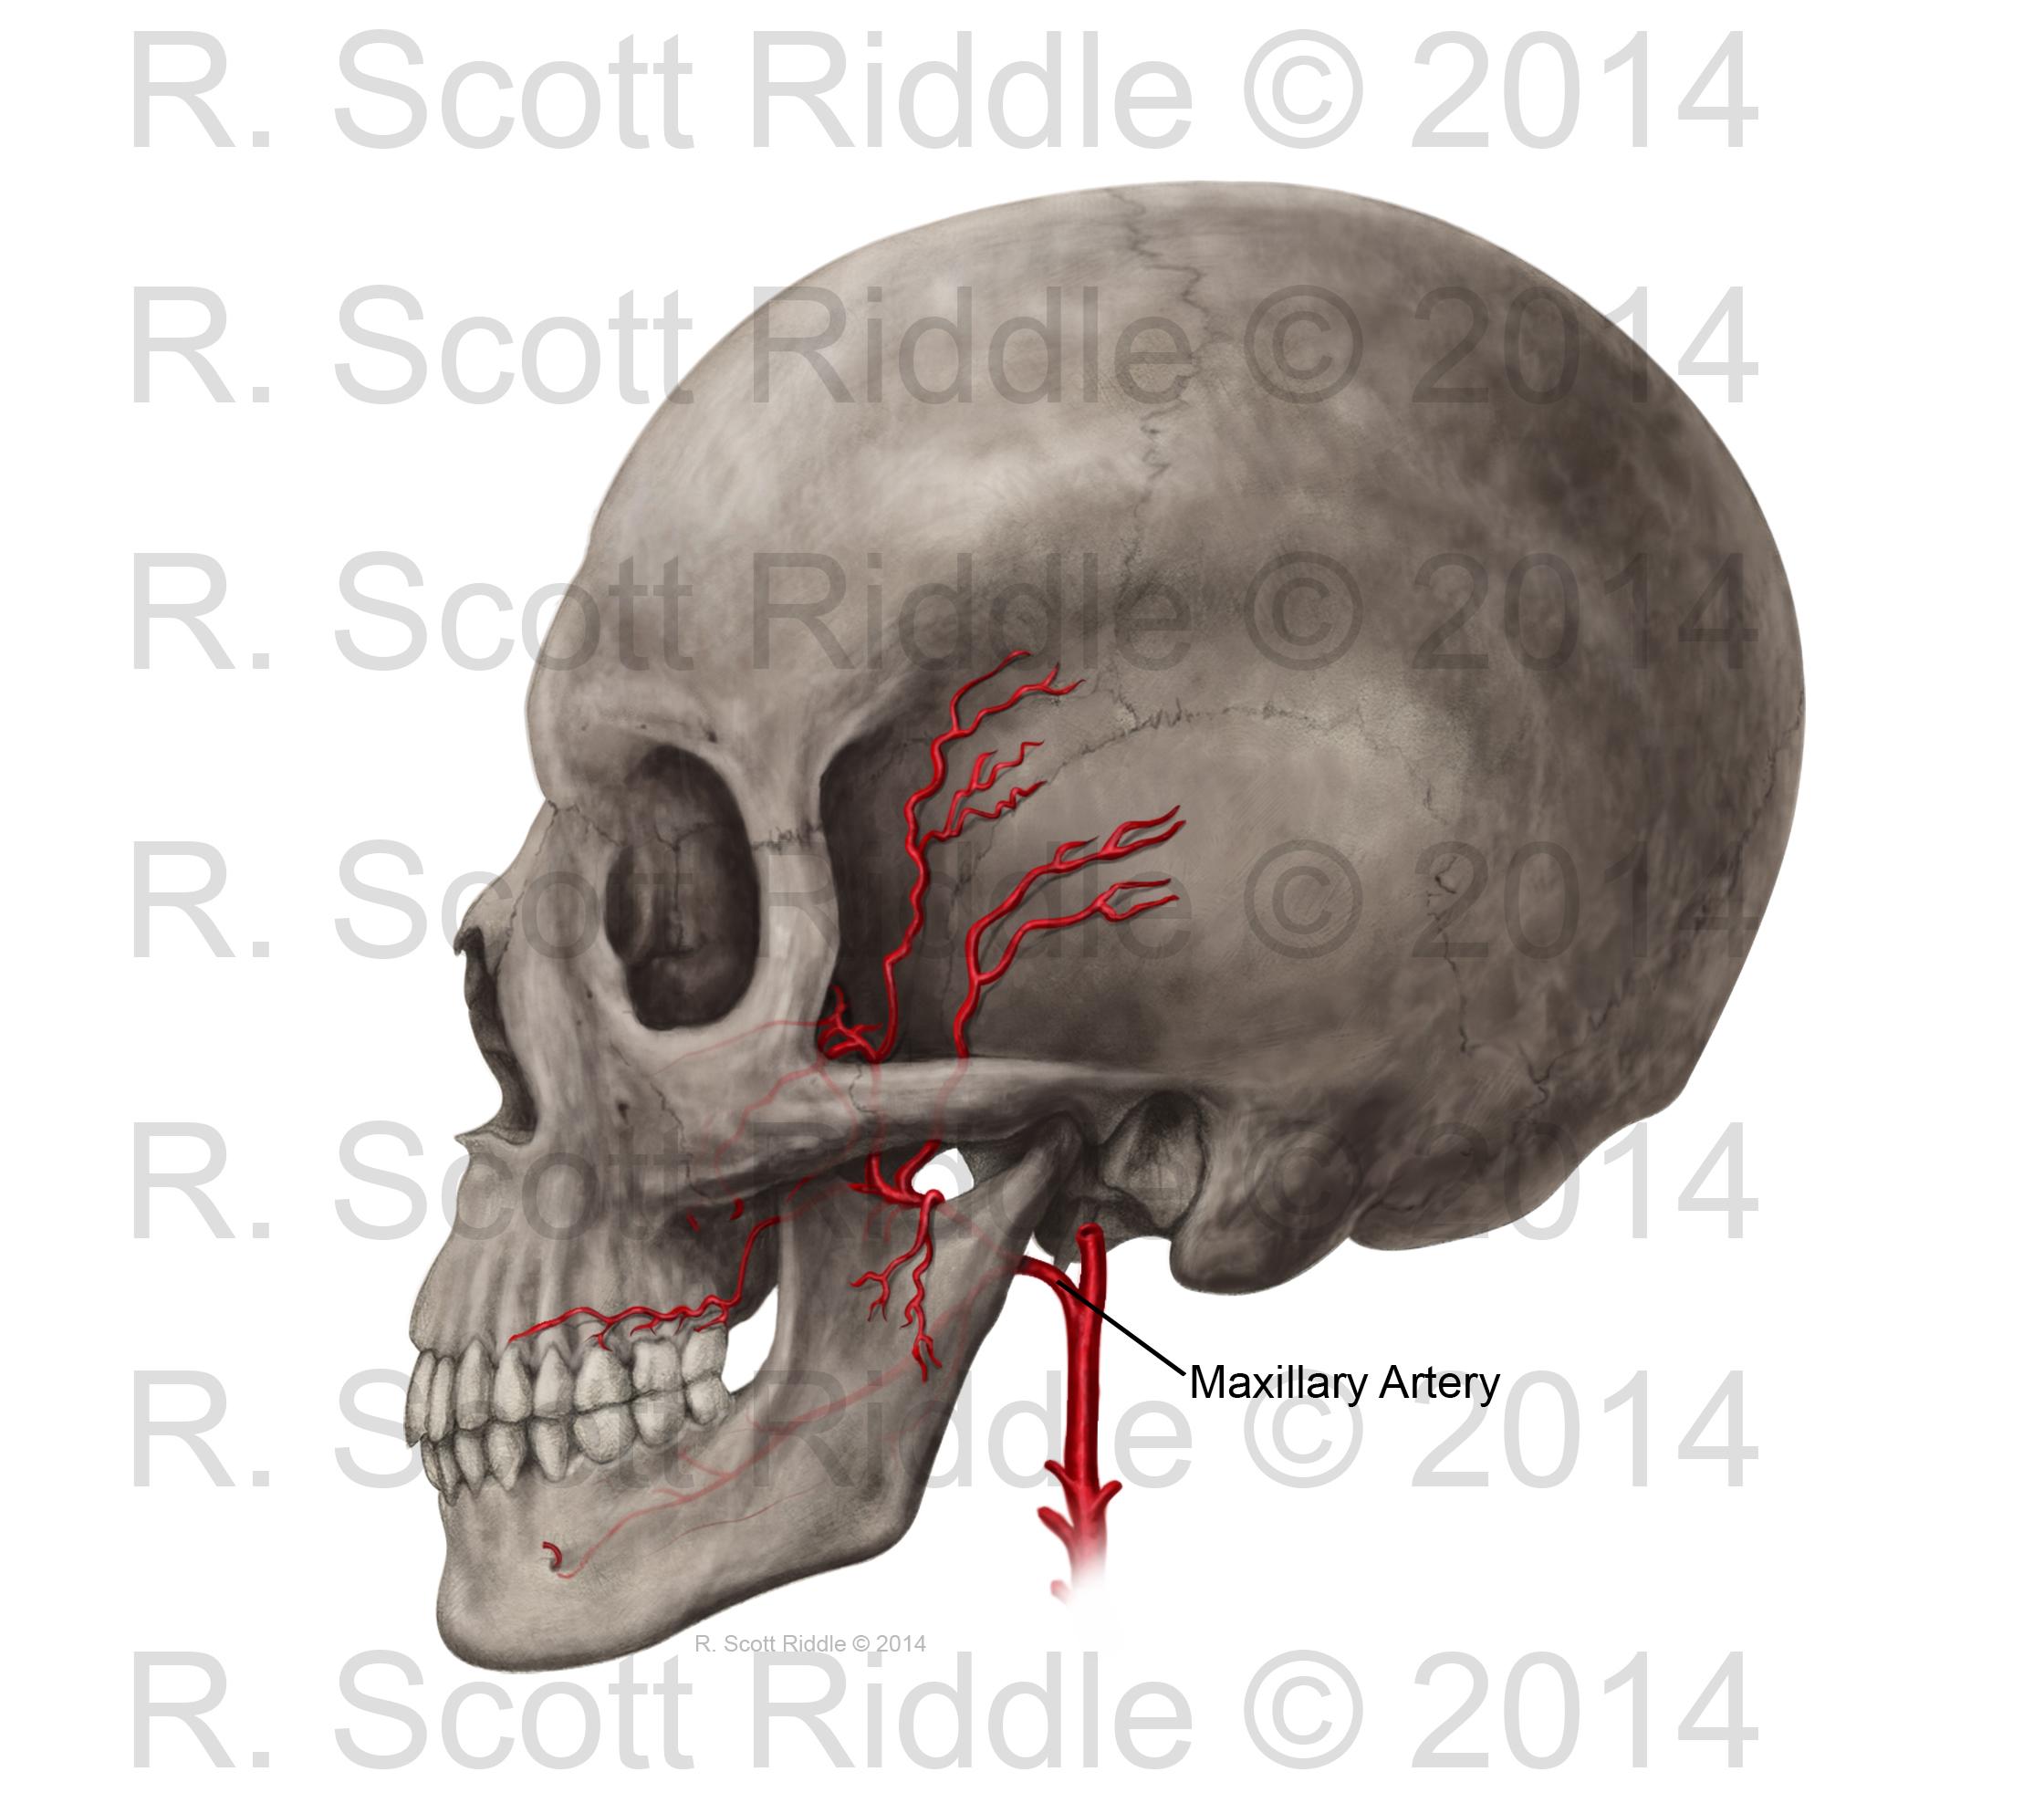 Lateral_SkullwMaxillaryArtery_RScottRiddle copy.jpg